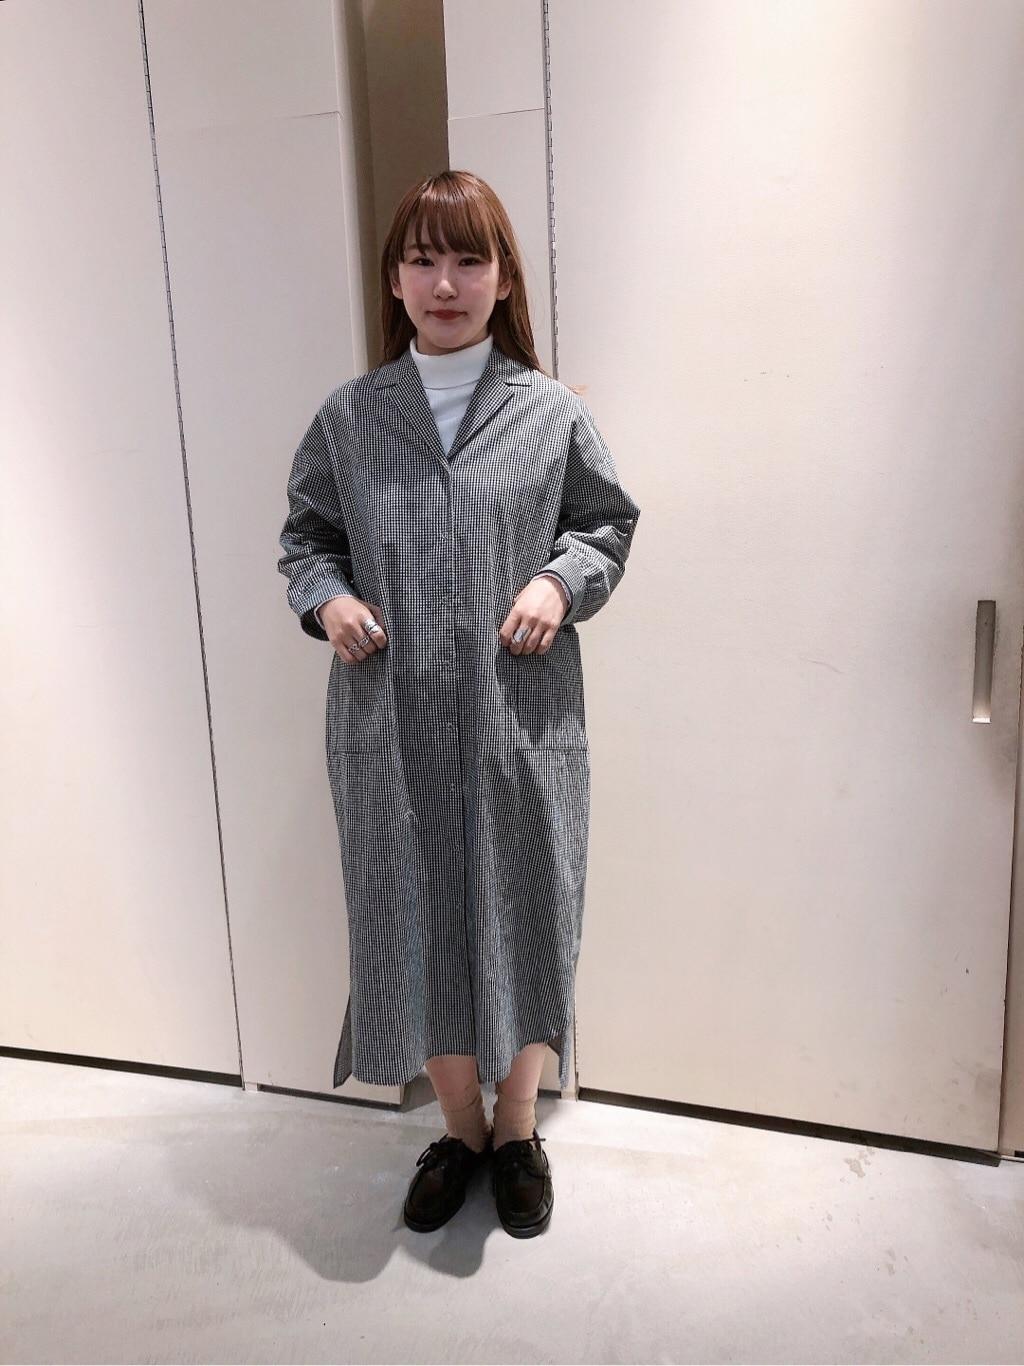 bulle de savon 阪急西宮ガーデンズ 身長:167cm 2019.08.24